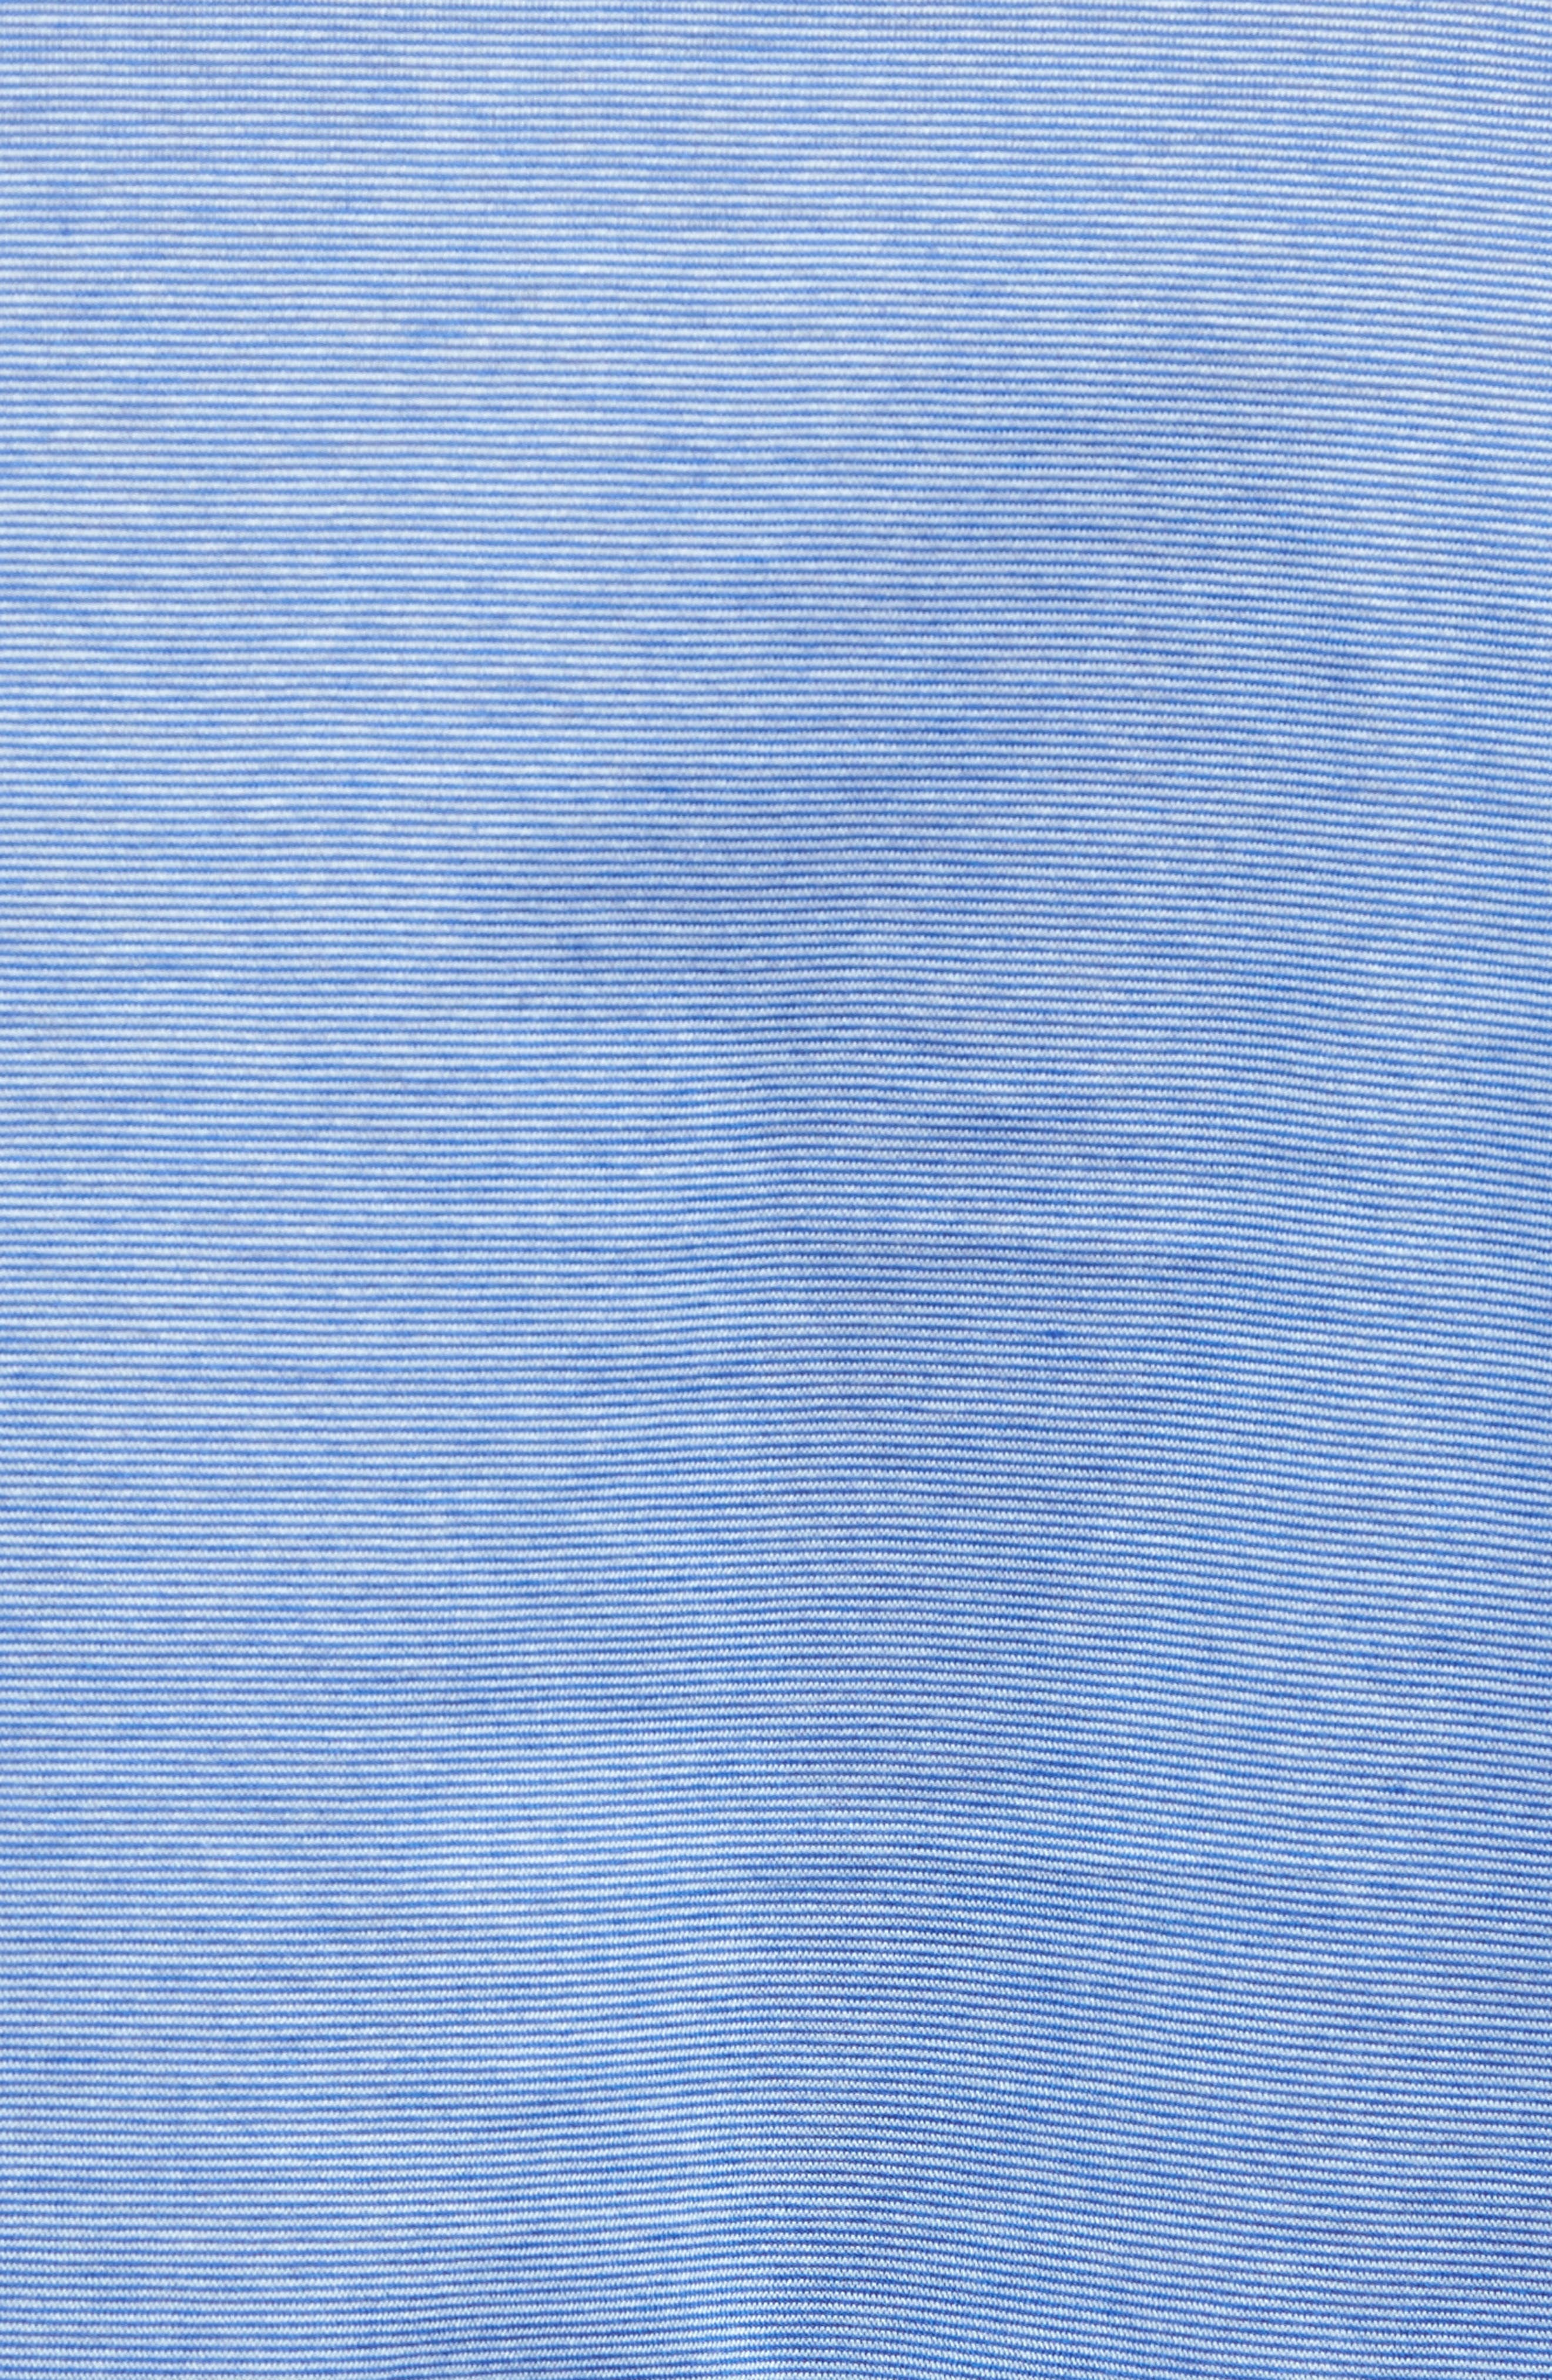 Fine Line Polo,                             Alternate thumbnail 5, color,                             Blue